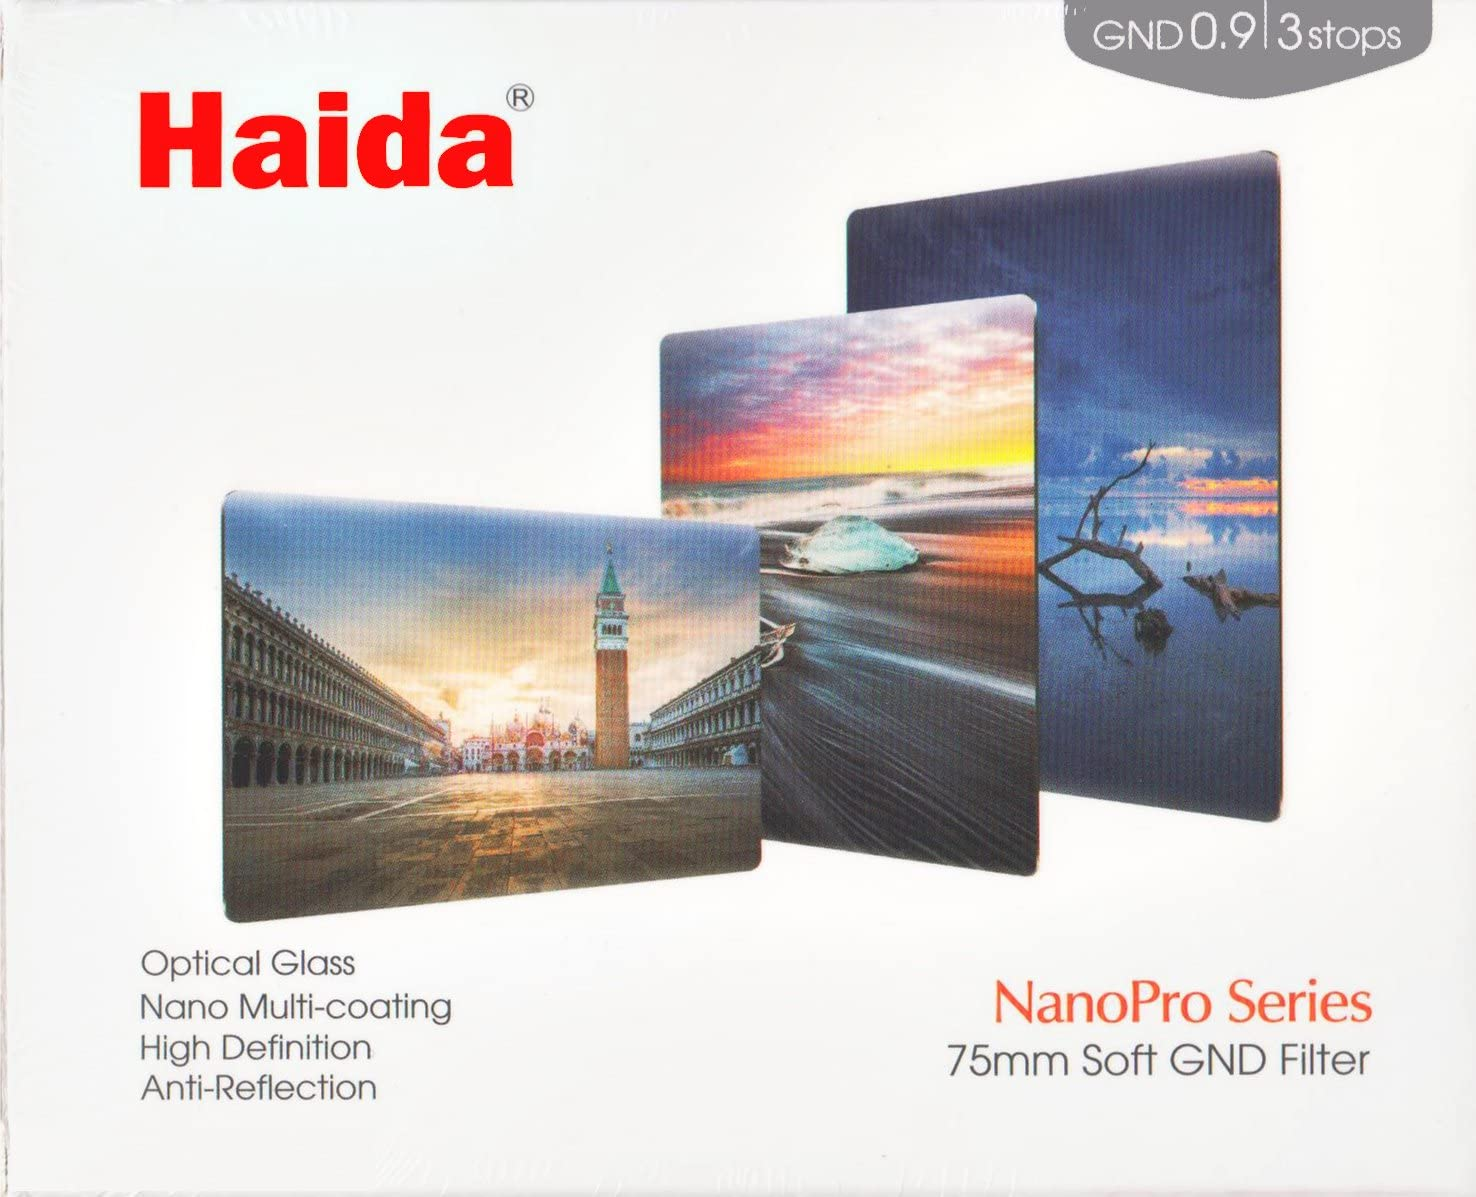 Haida NanoPro 75-Pro Soft Grad Filter GND0.9 ND8 0.9 75mm x 100mm HD3432